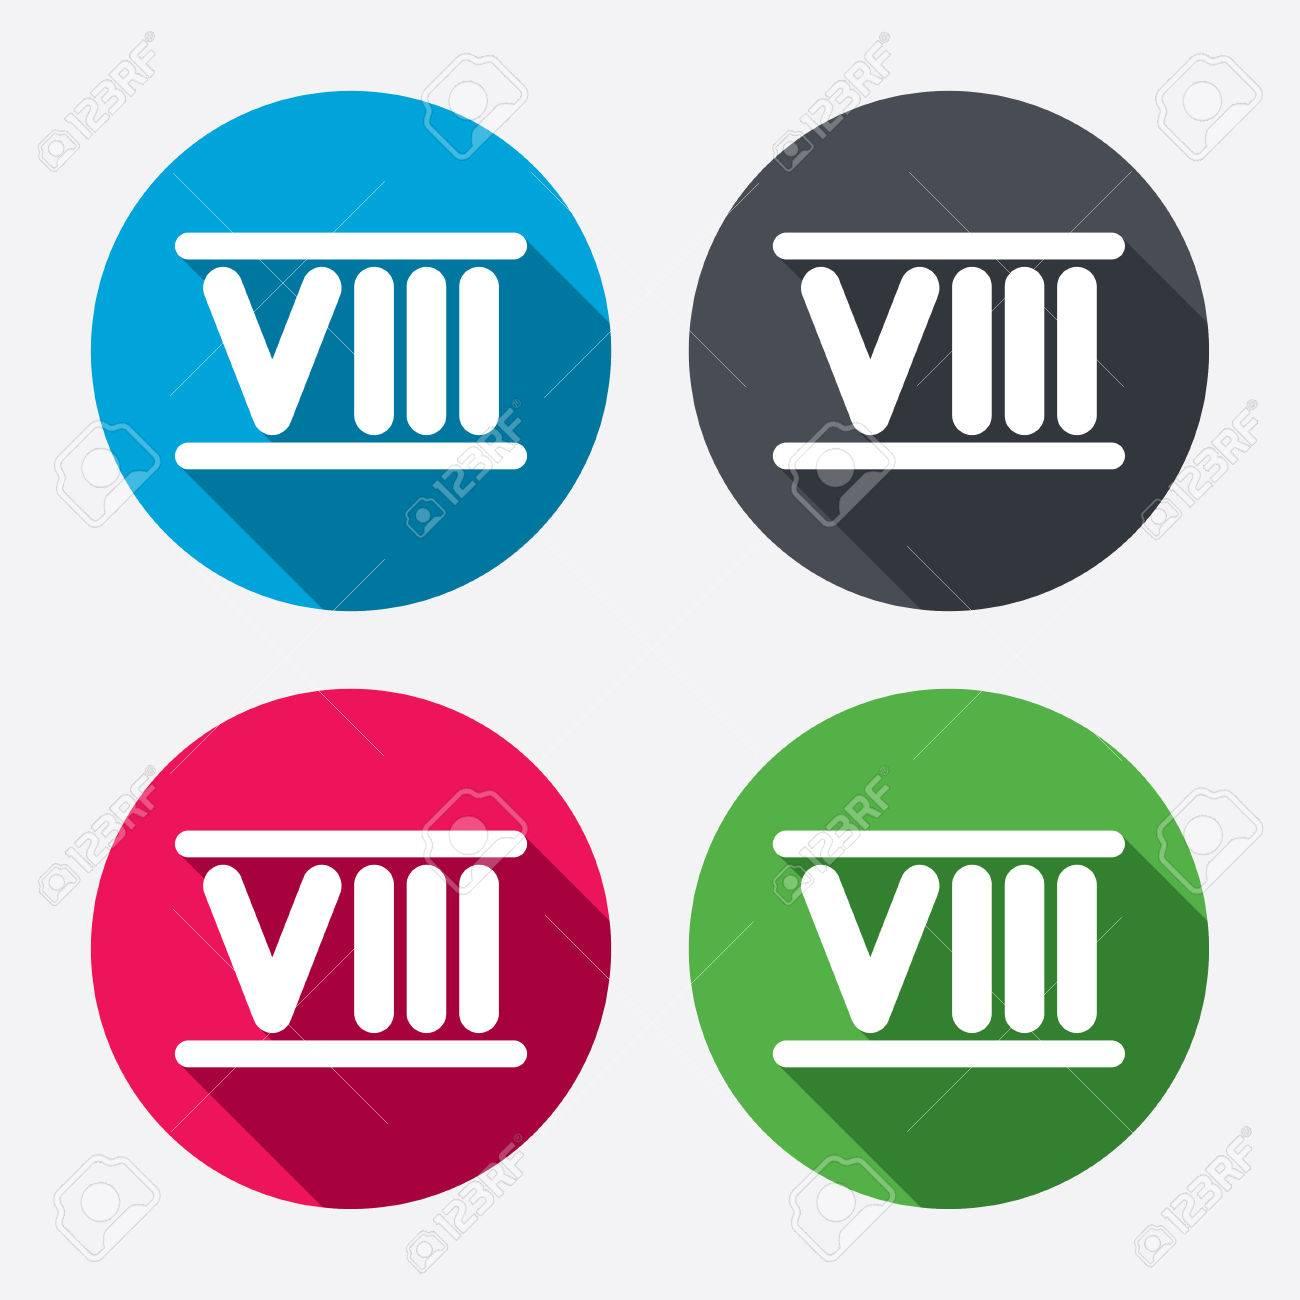 Chiffre Romain 4 chiffre romain huit signe icône. chiffre romain huit symbole